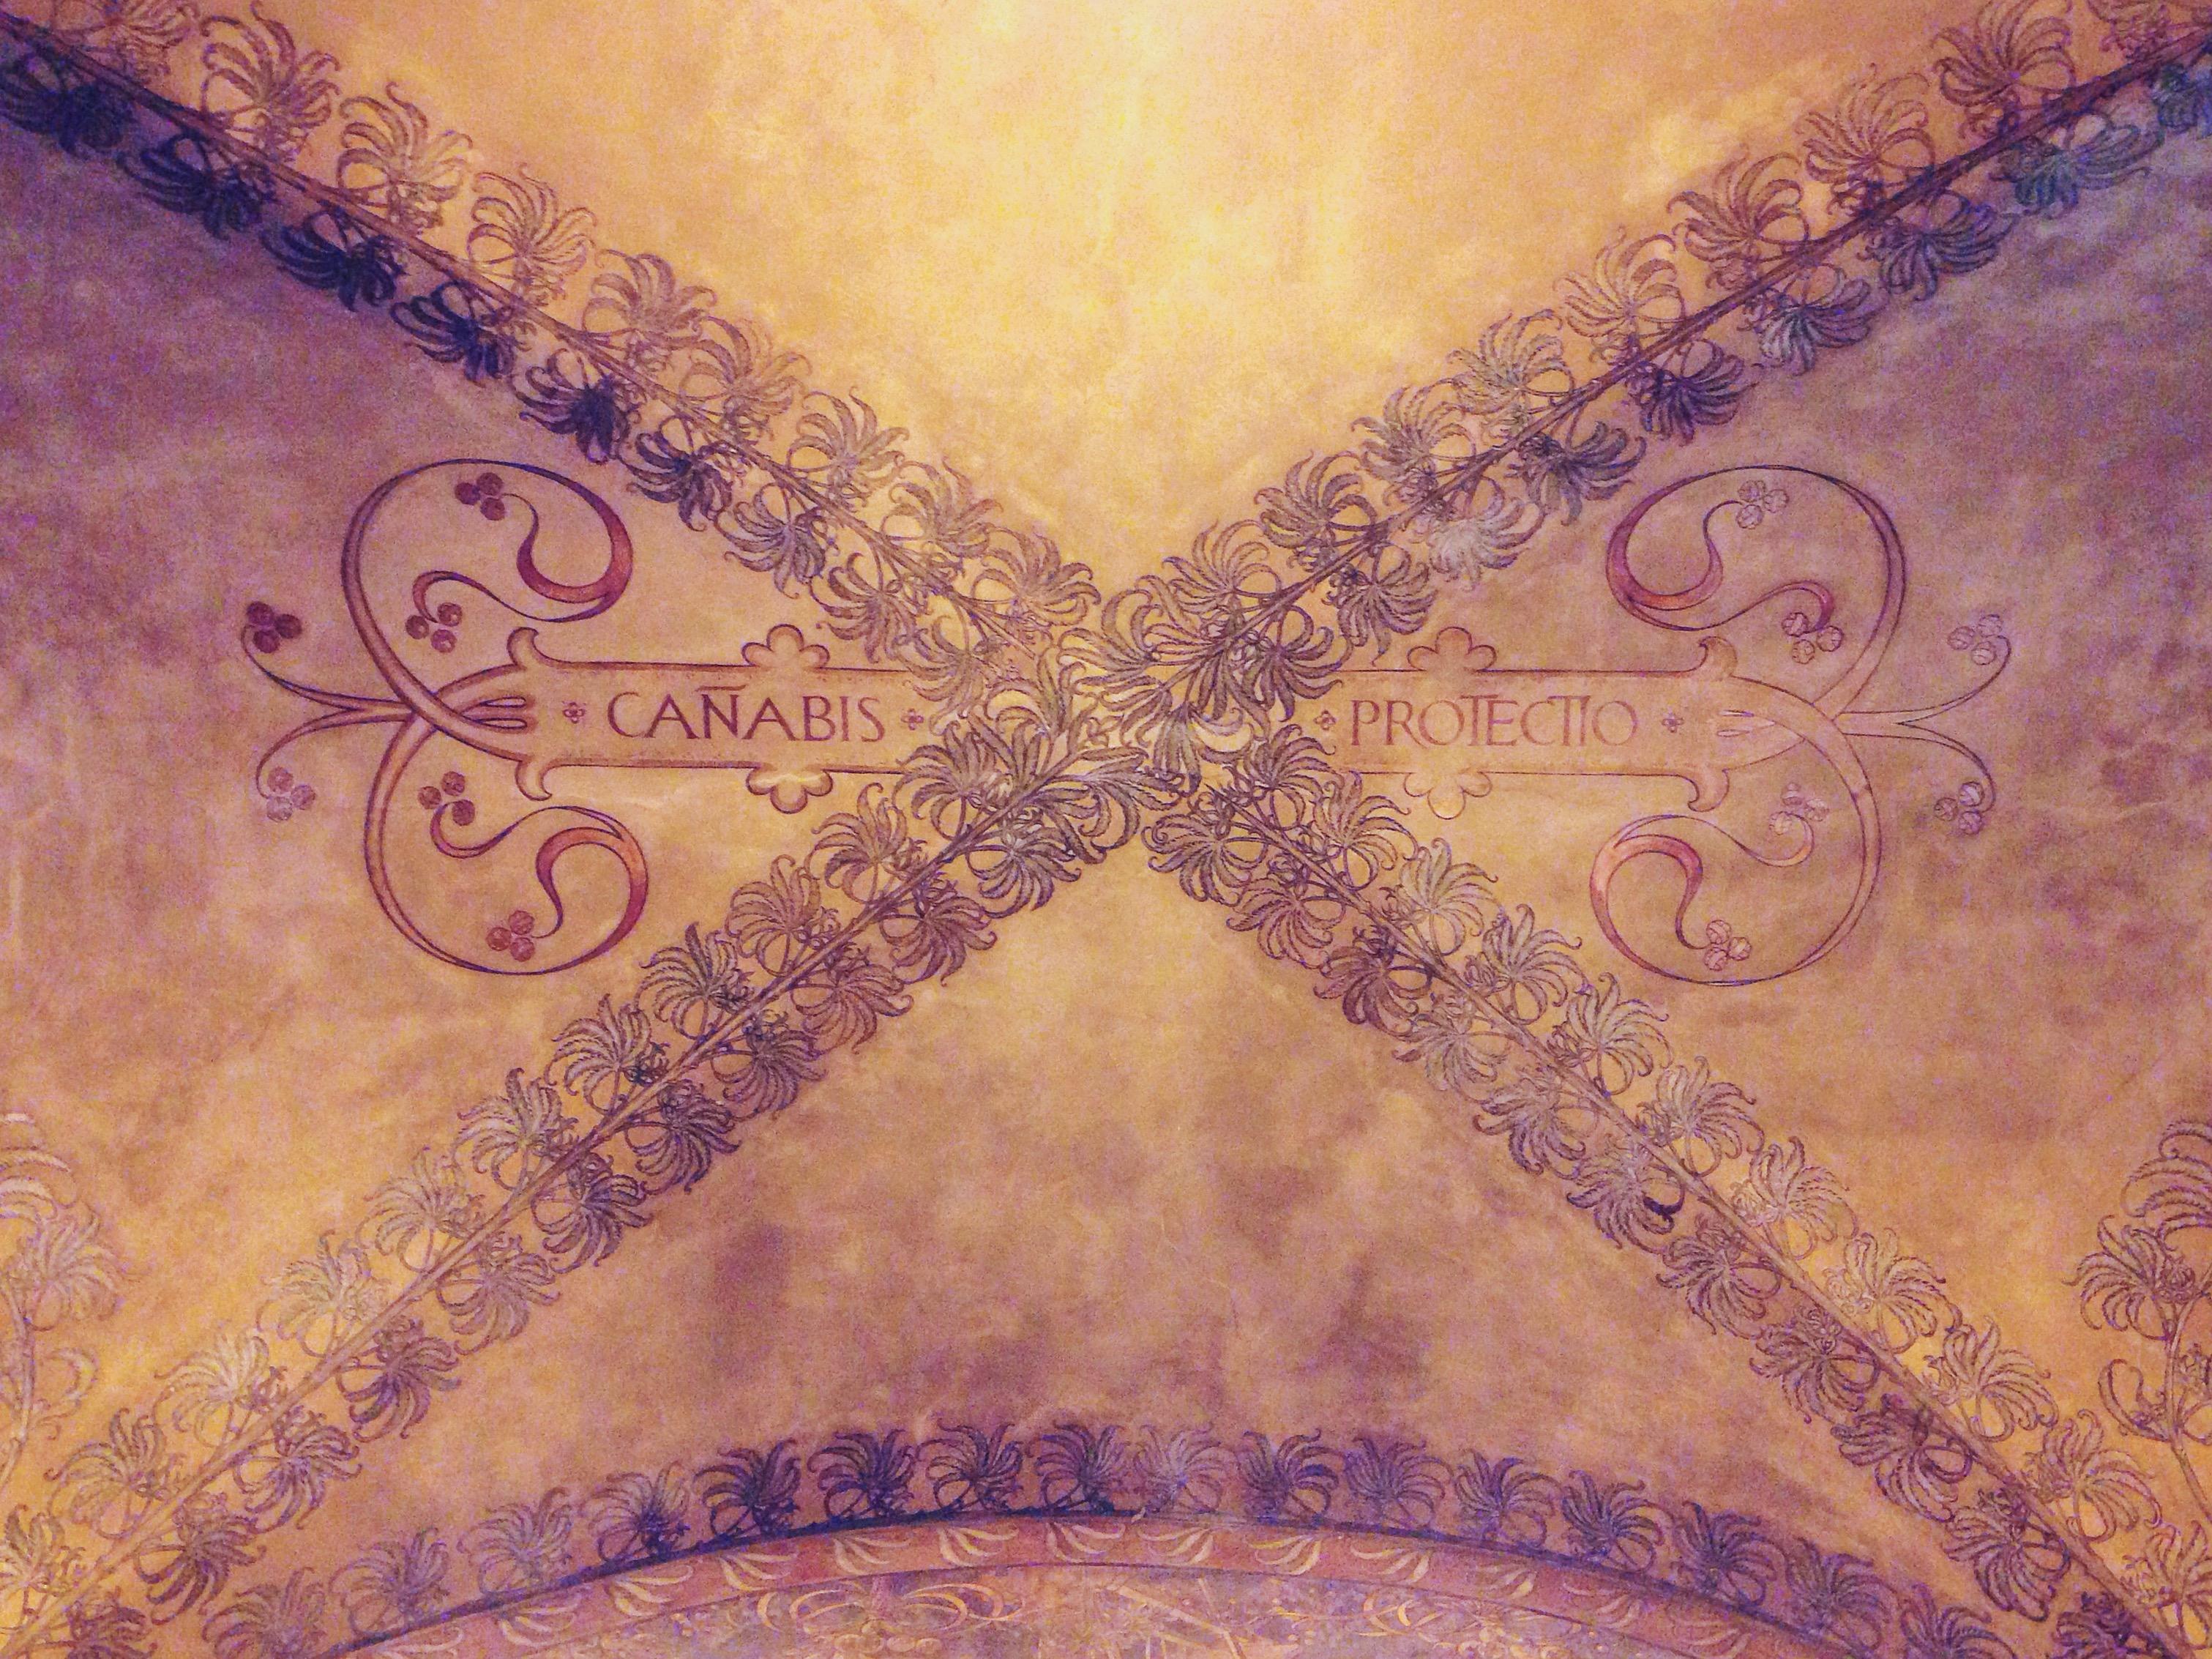 I sette segreti di Bologna - panis vita, canabis protectio, vinum laetitia